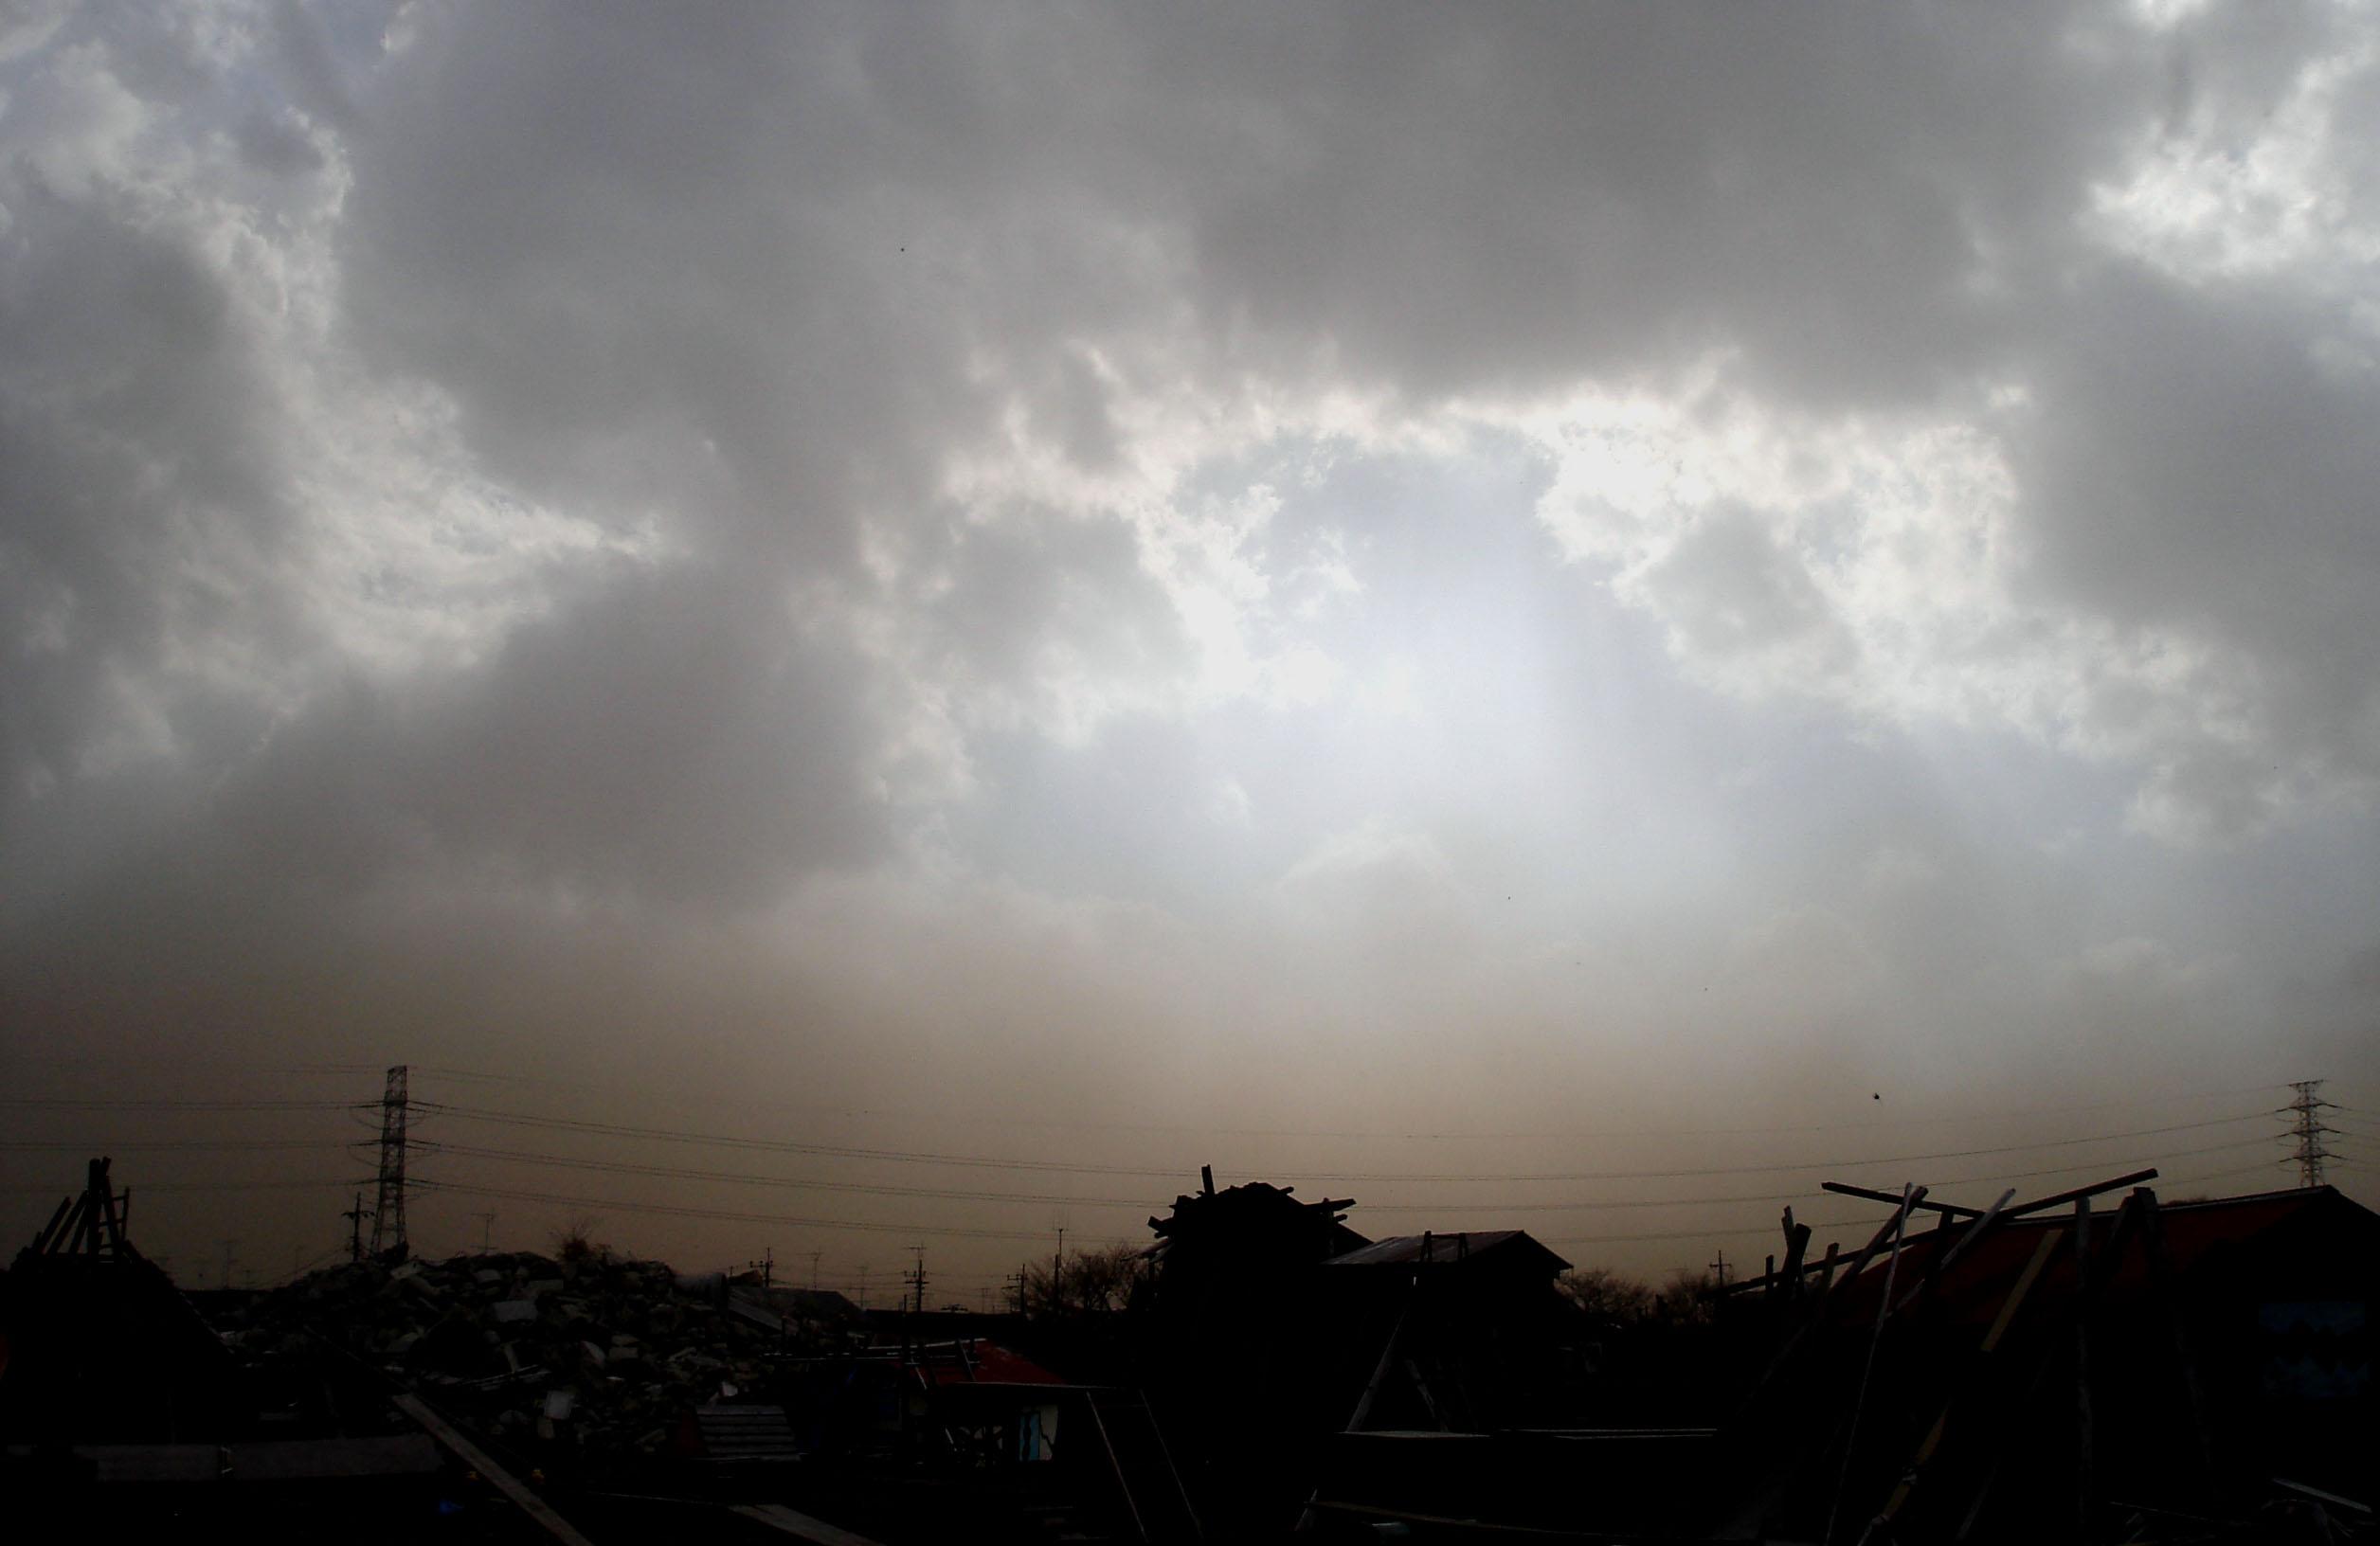 Dsc00292 旋風の通過33 雲間から日が差し始める⑥